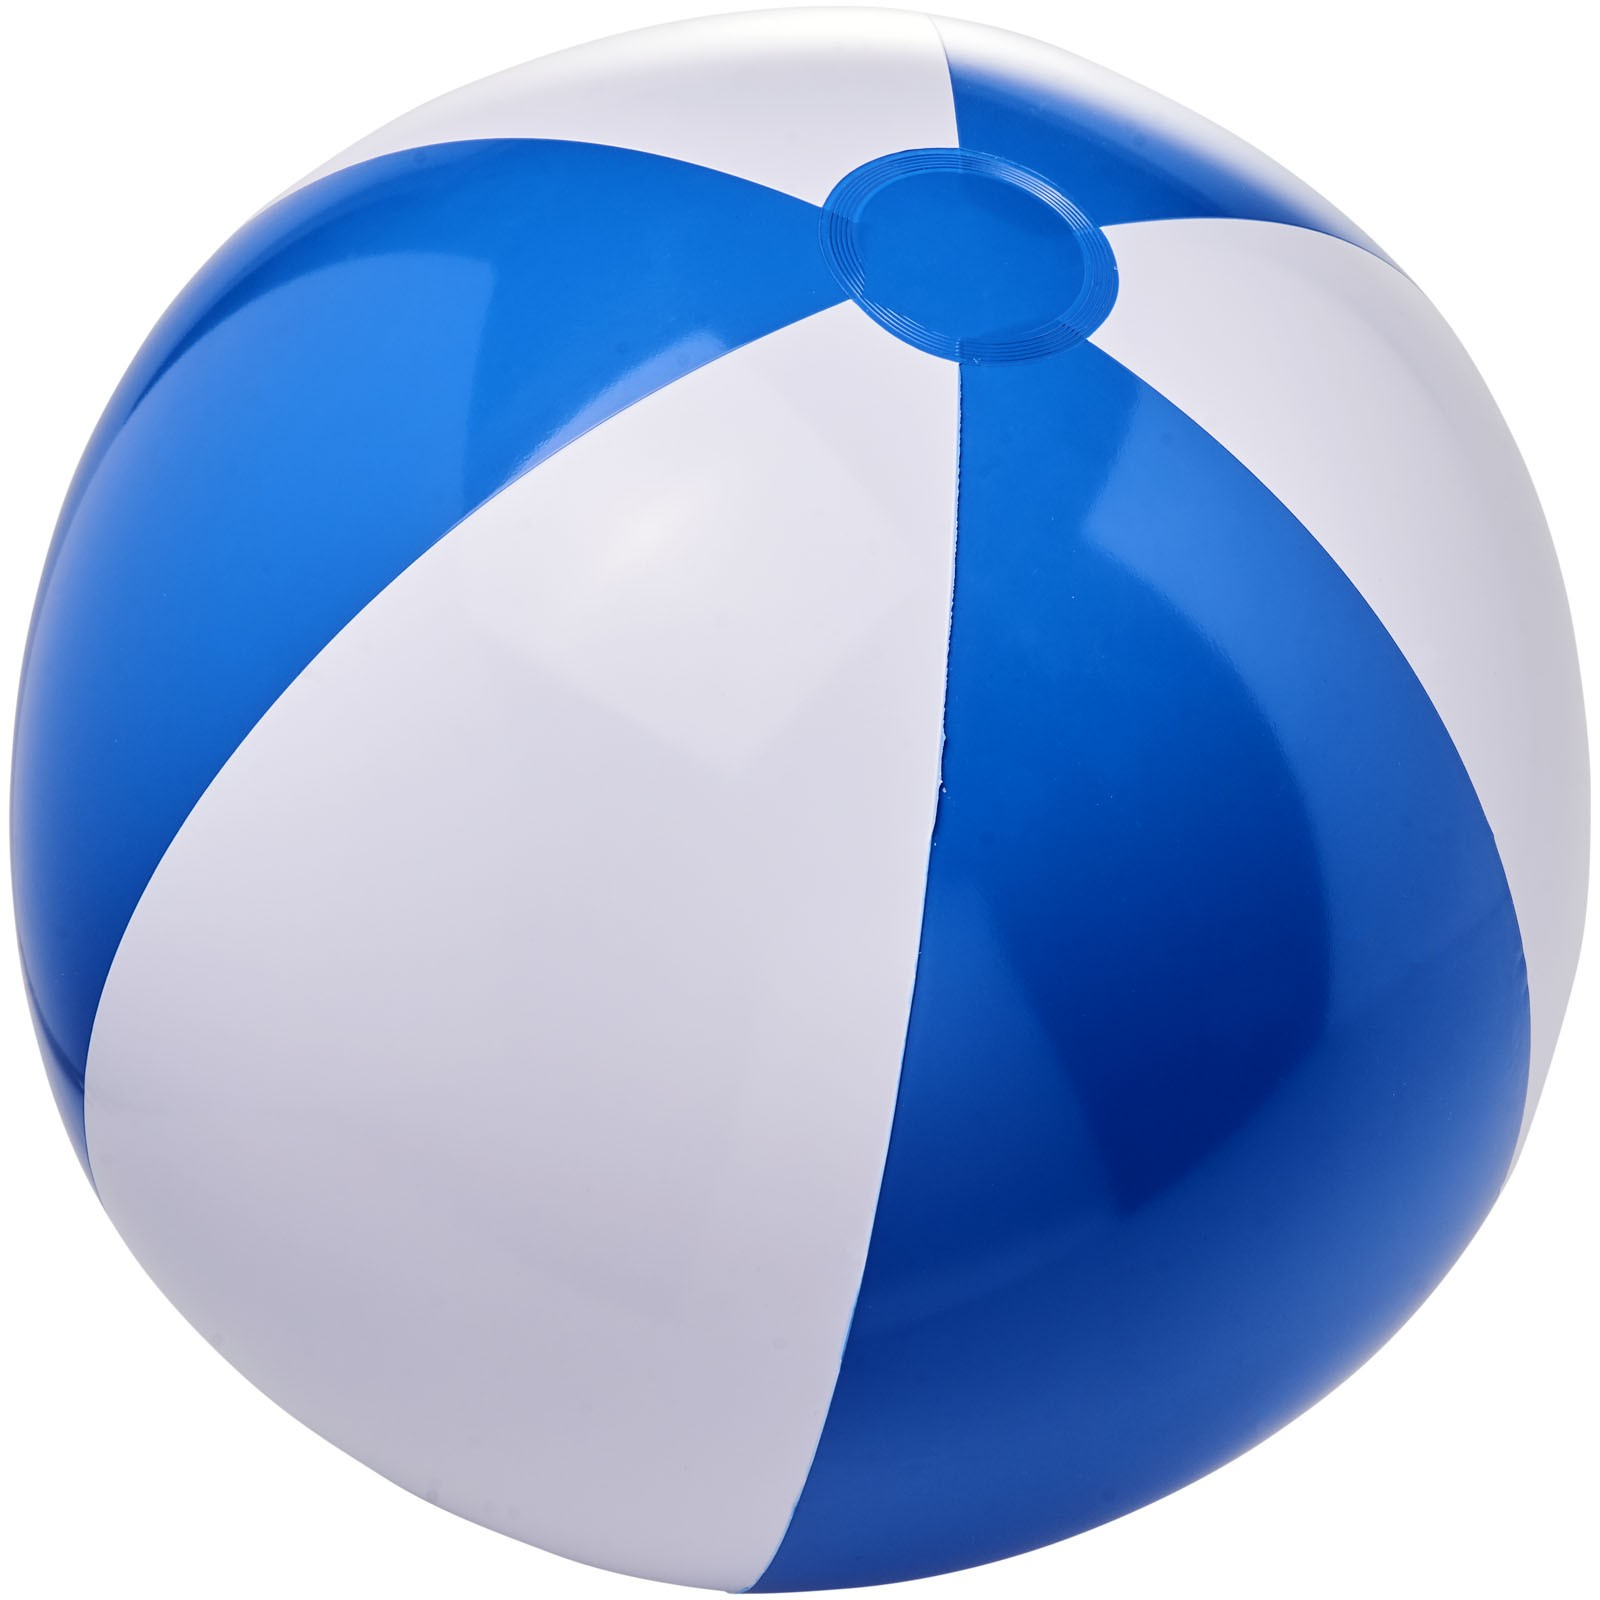 Bora Wasserball - Royalblau / Weiss